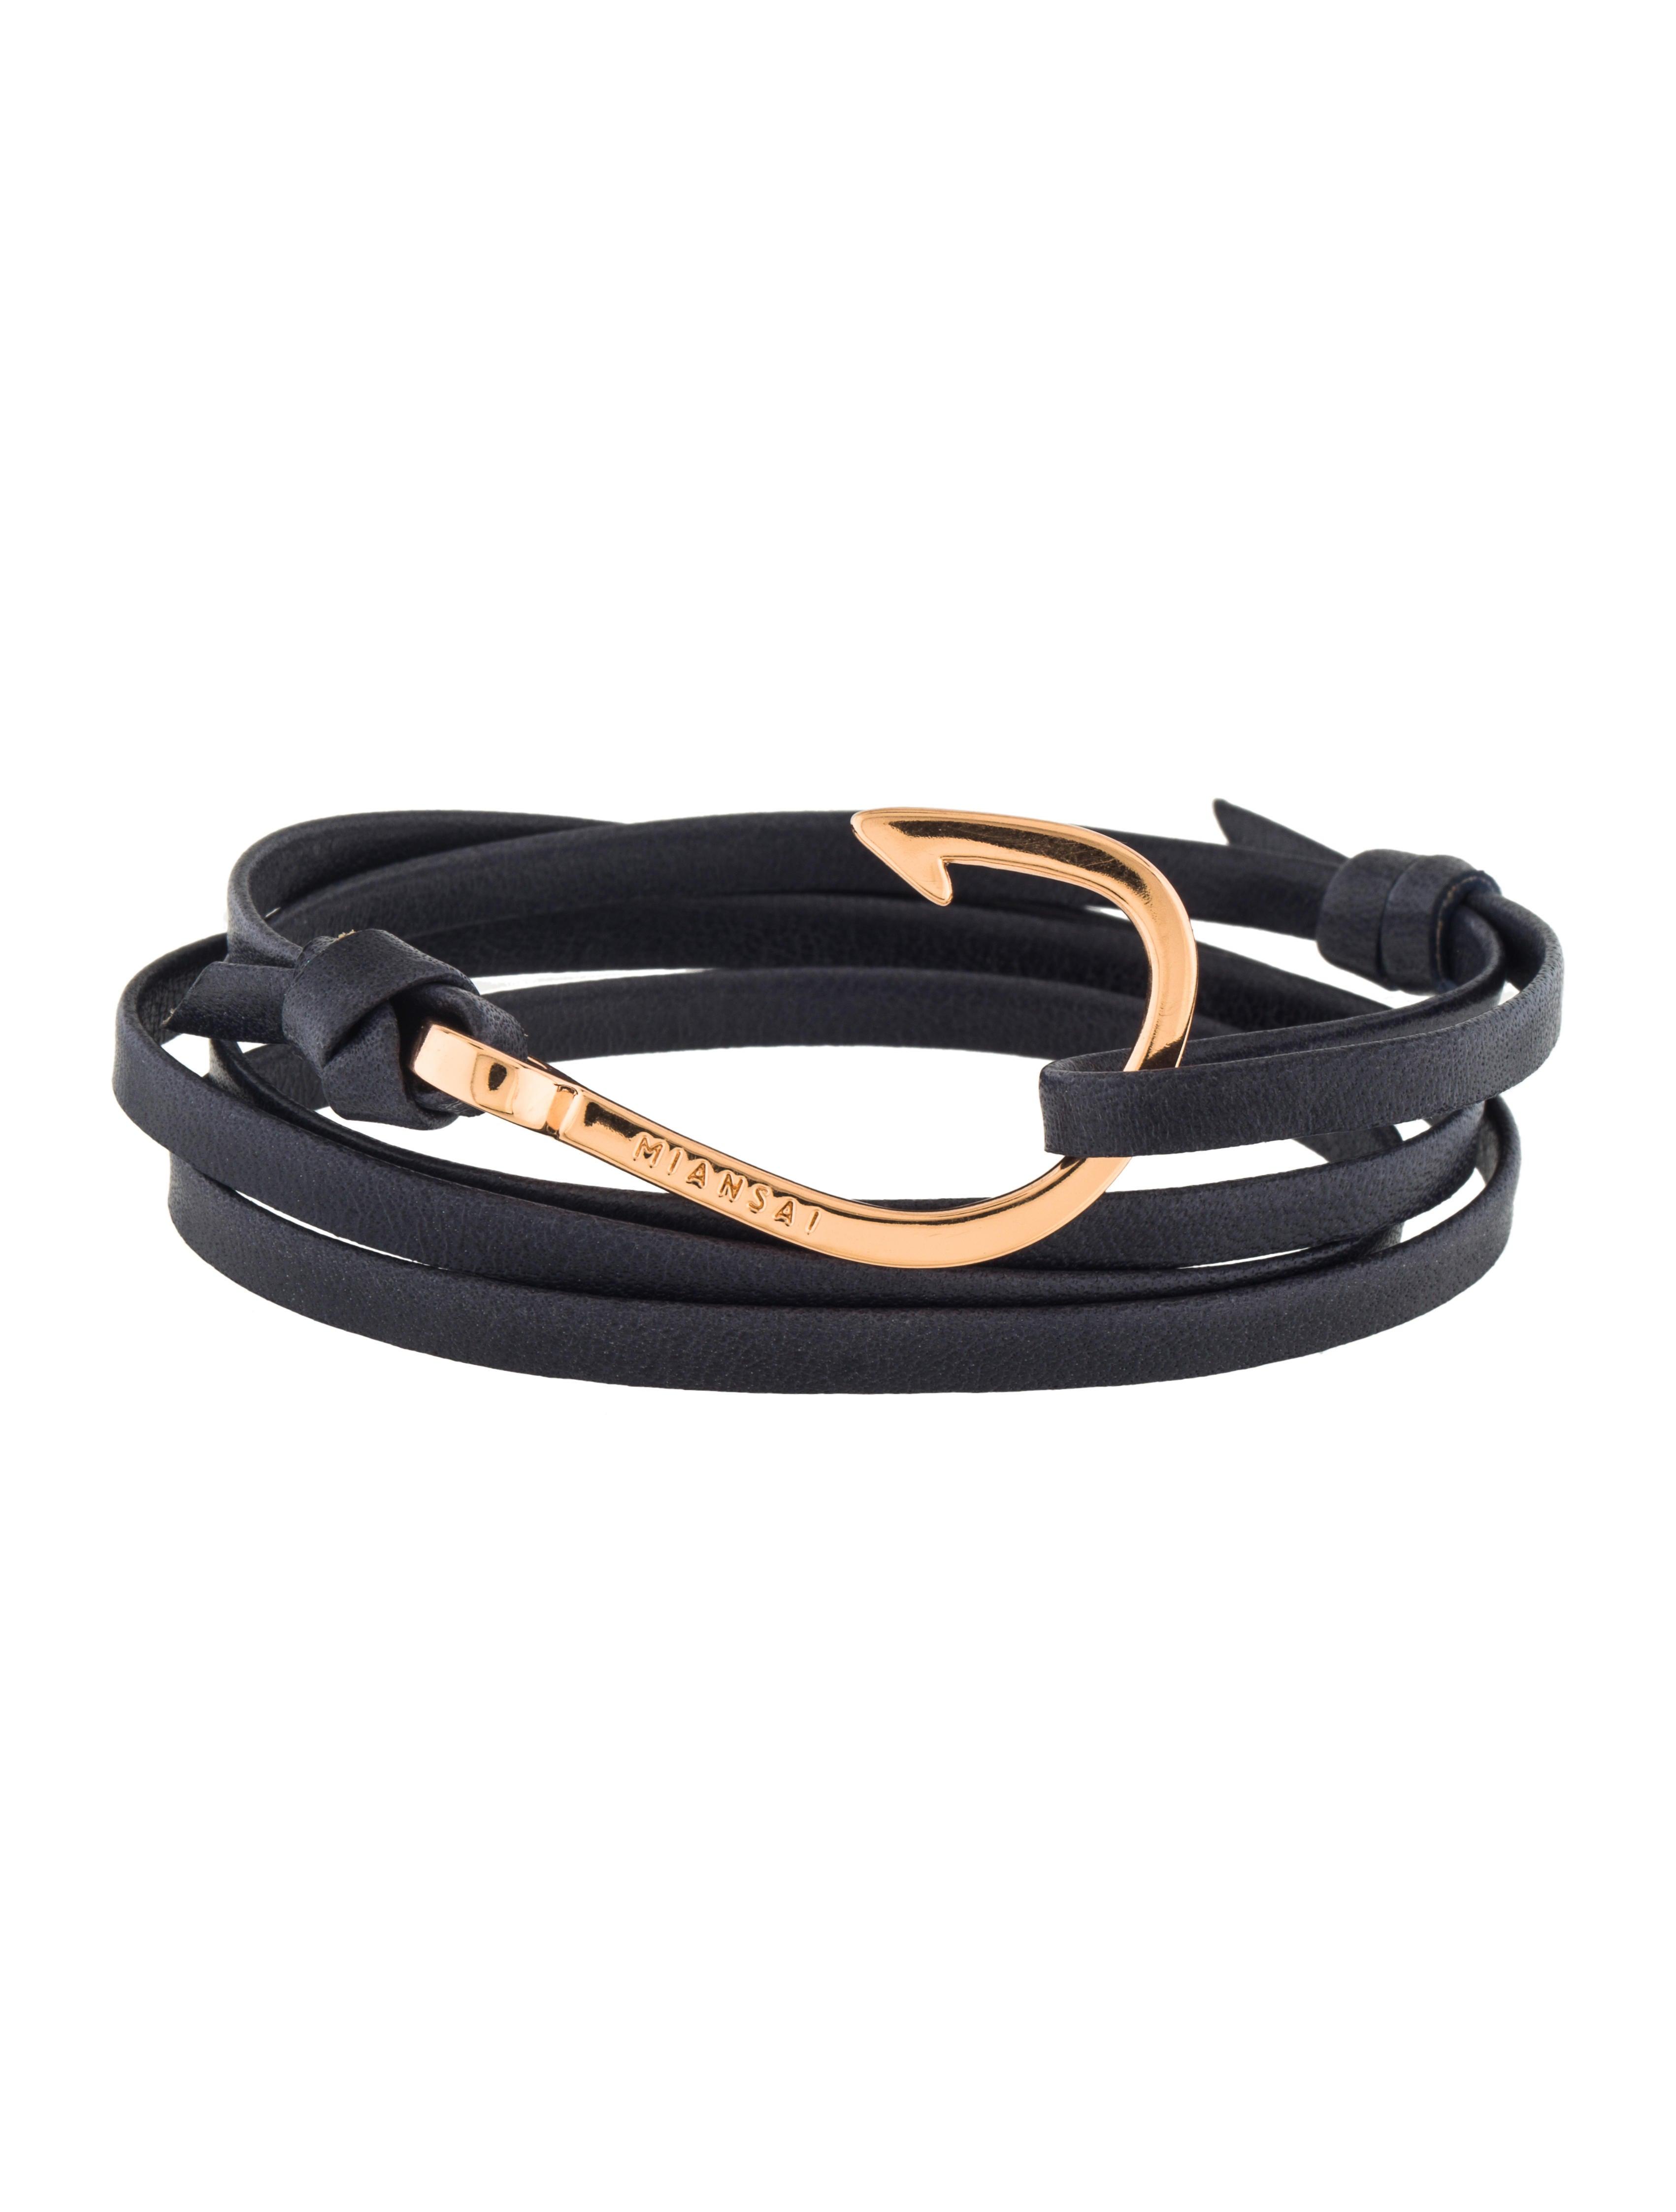 hook up bracelet Caribbean hook bracelets – are you looking for original caribbean hook bracelets bluedolphingold offers variety of original caribbean hook bracelets and fish hook bracelets.